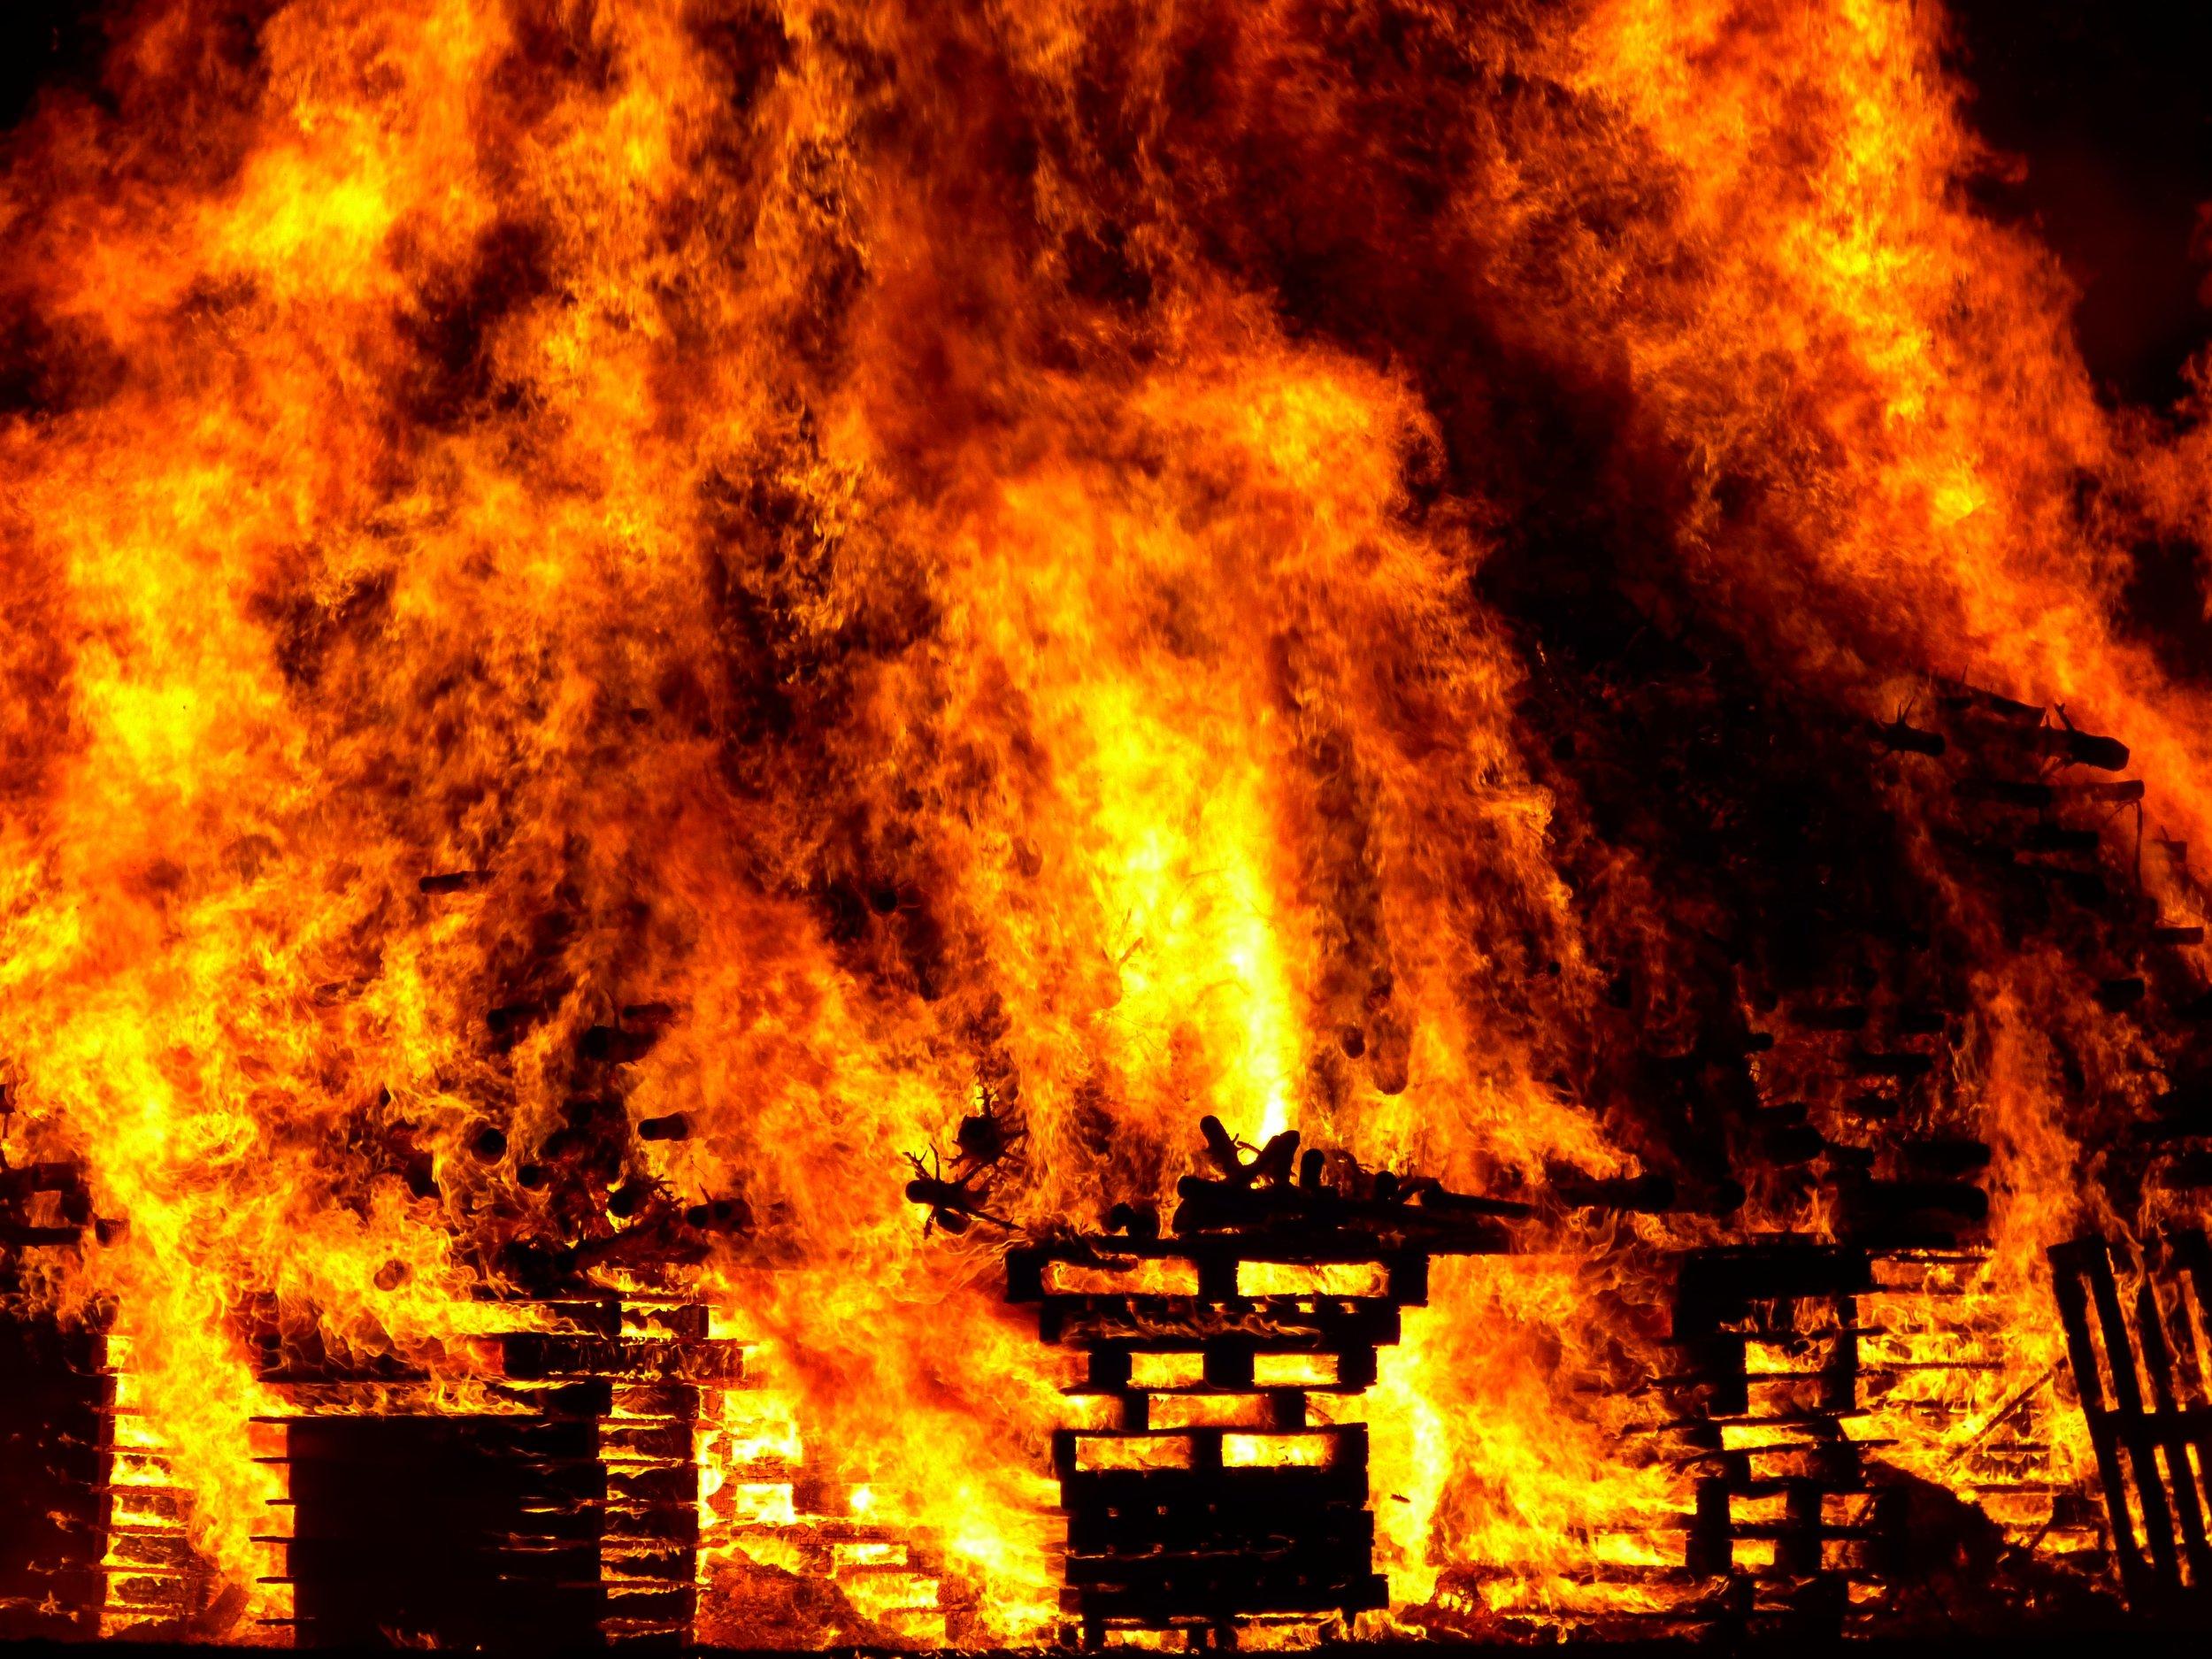 fire-burn-hell-warm-57461.jpeg